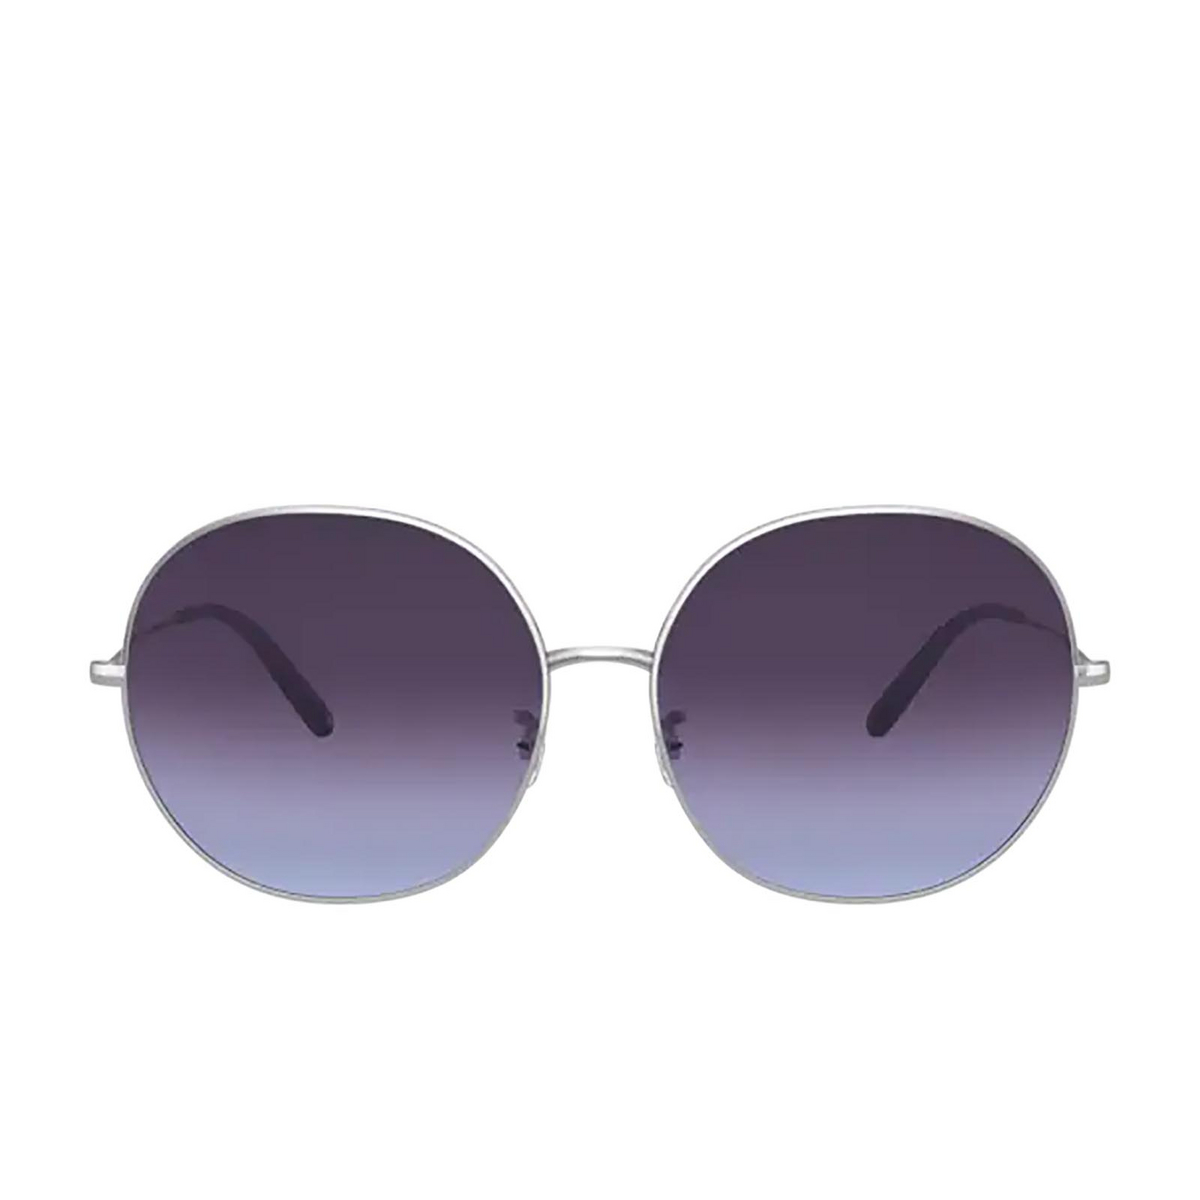 Oliver Peoples® Round Sunglasses: Darlen OV1280S color Silver 503679.